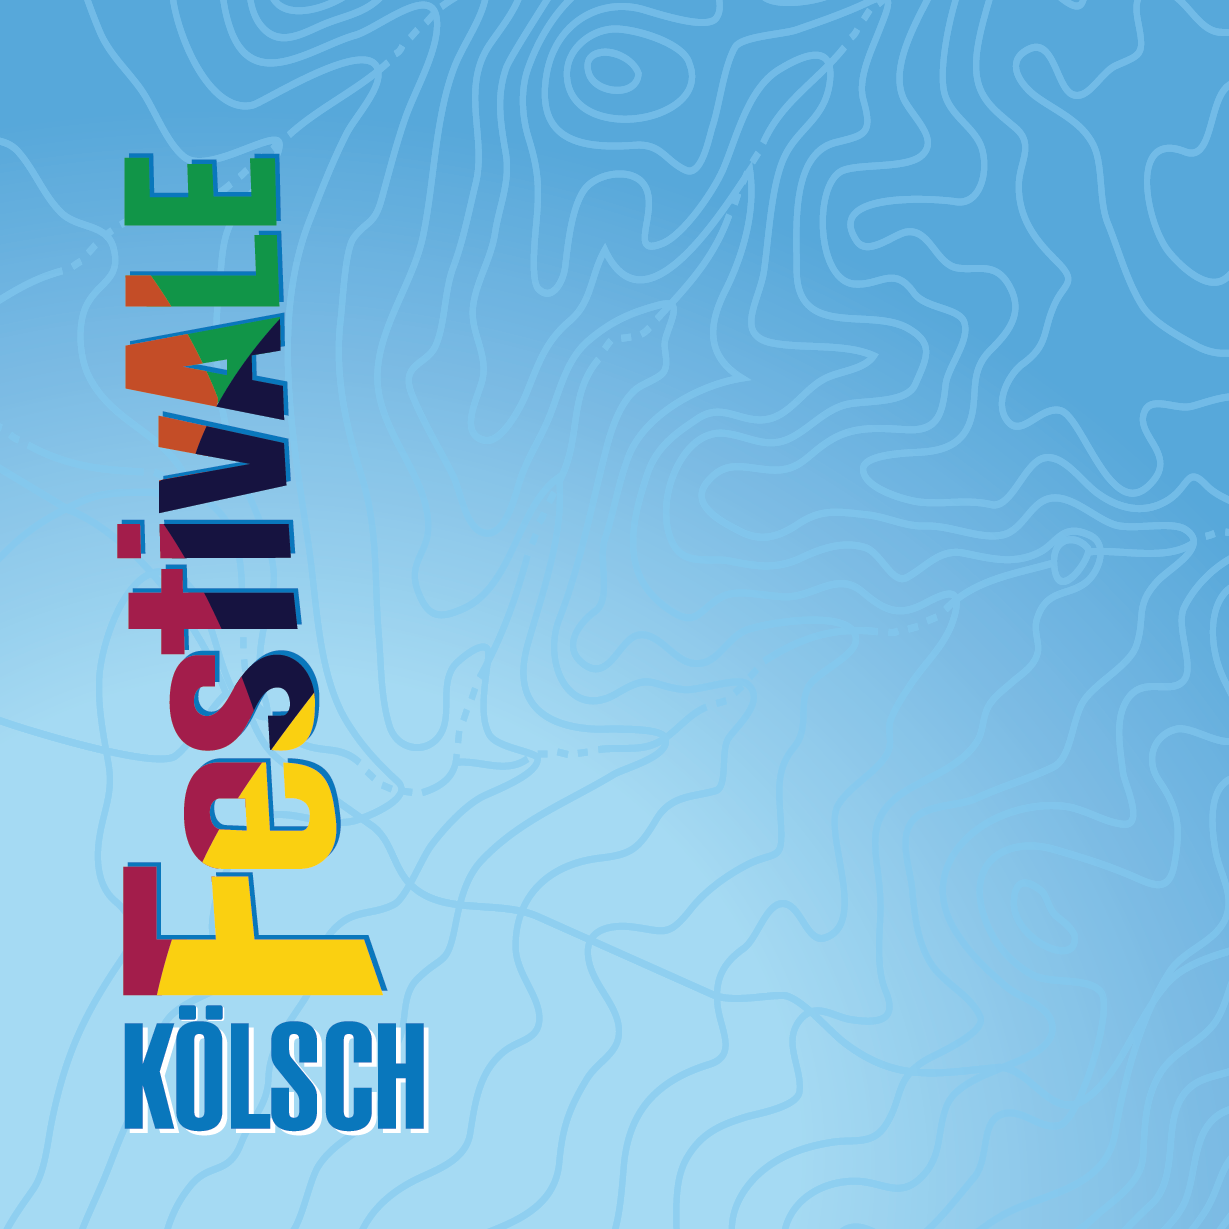 Festivale Kölsch.png